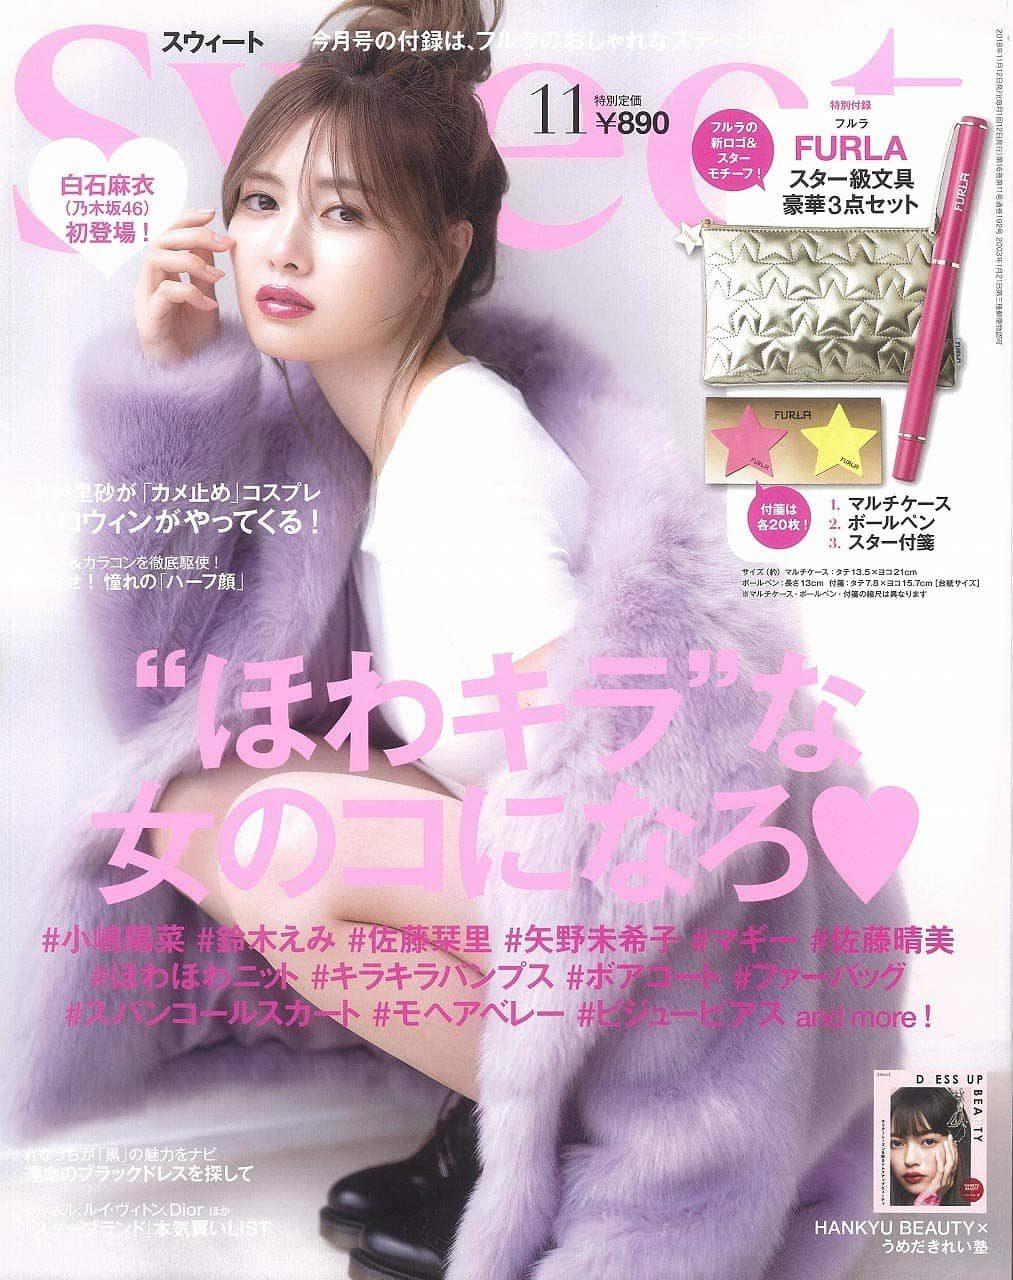 乃木坂46白石麻衣「Sweet 2018年11月号」表紙掲載&初登場スペシャル! [10/12発売]